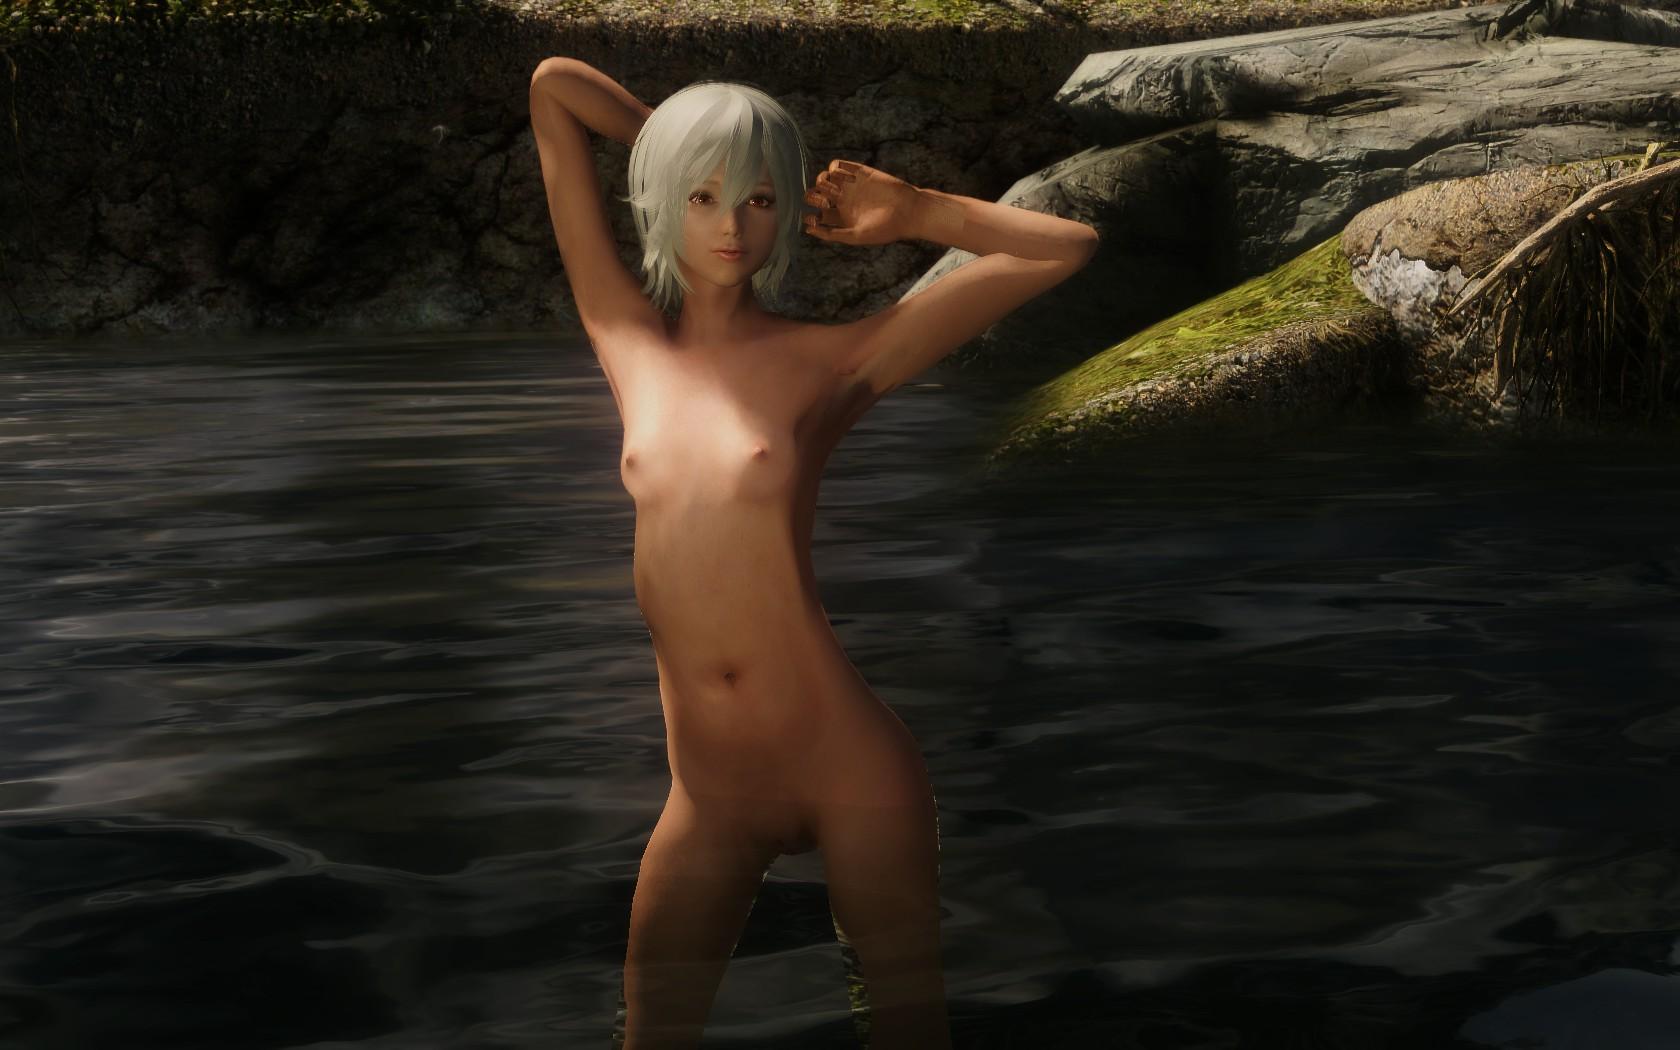 Bluxxy haze yougaleryr nude massage